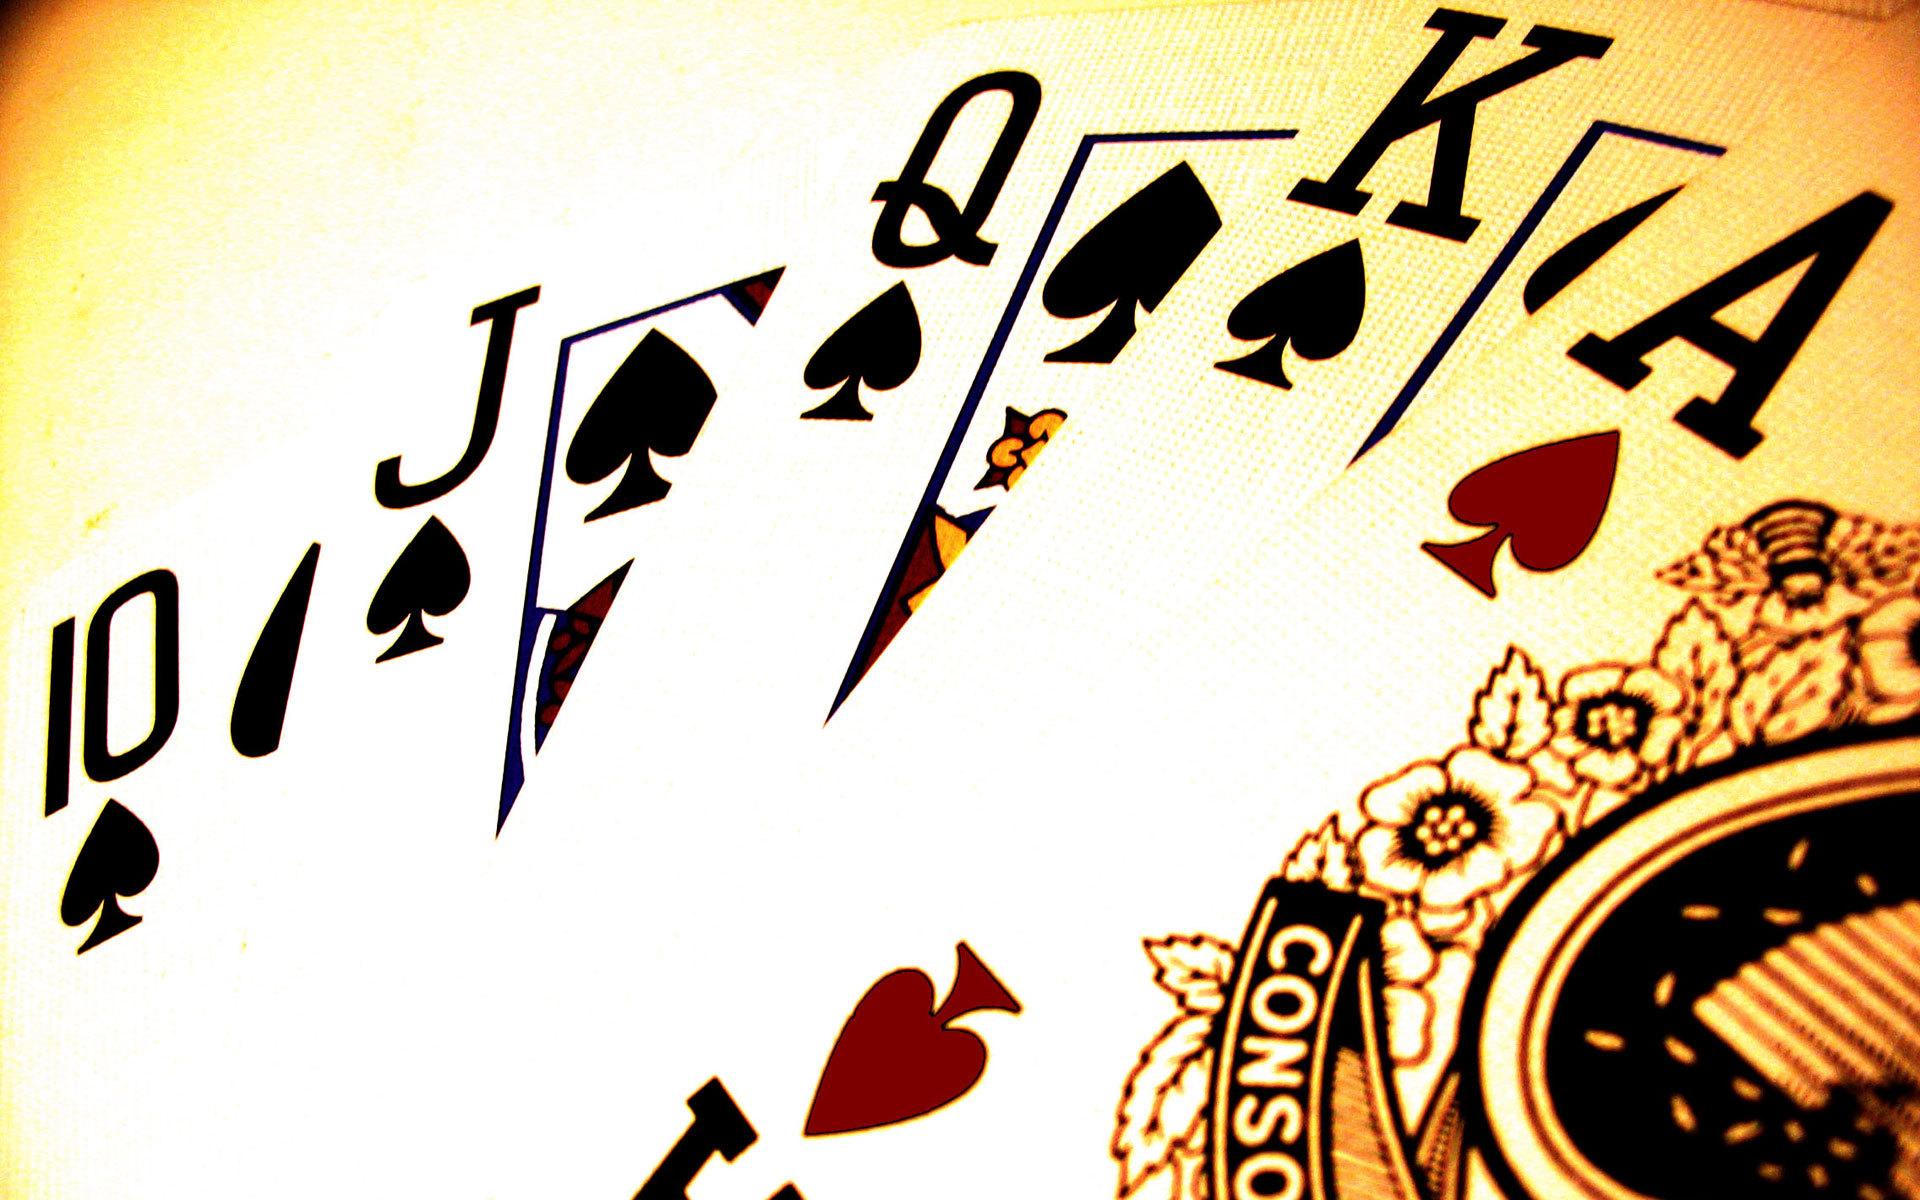 karty-poker-royal-flesh-royal.jpg (1920×1200)